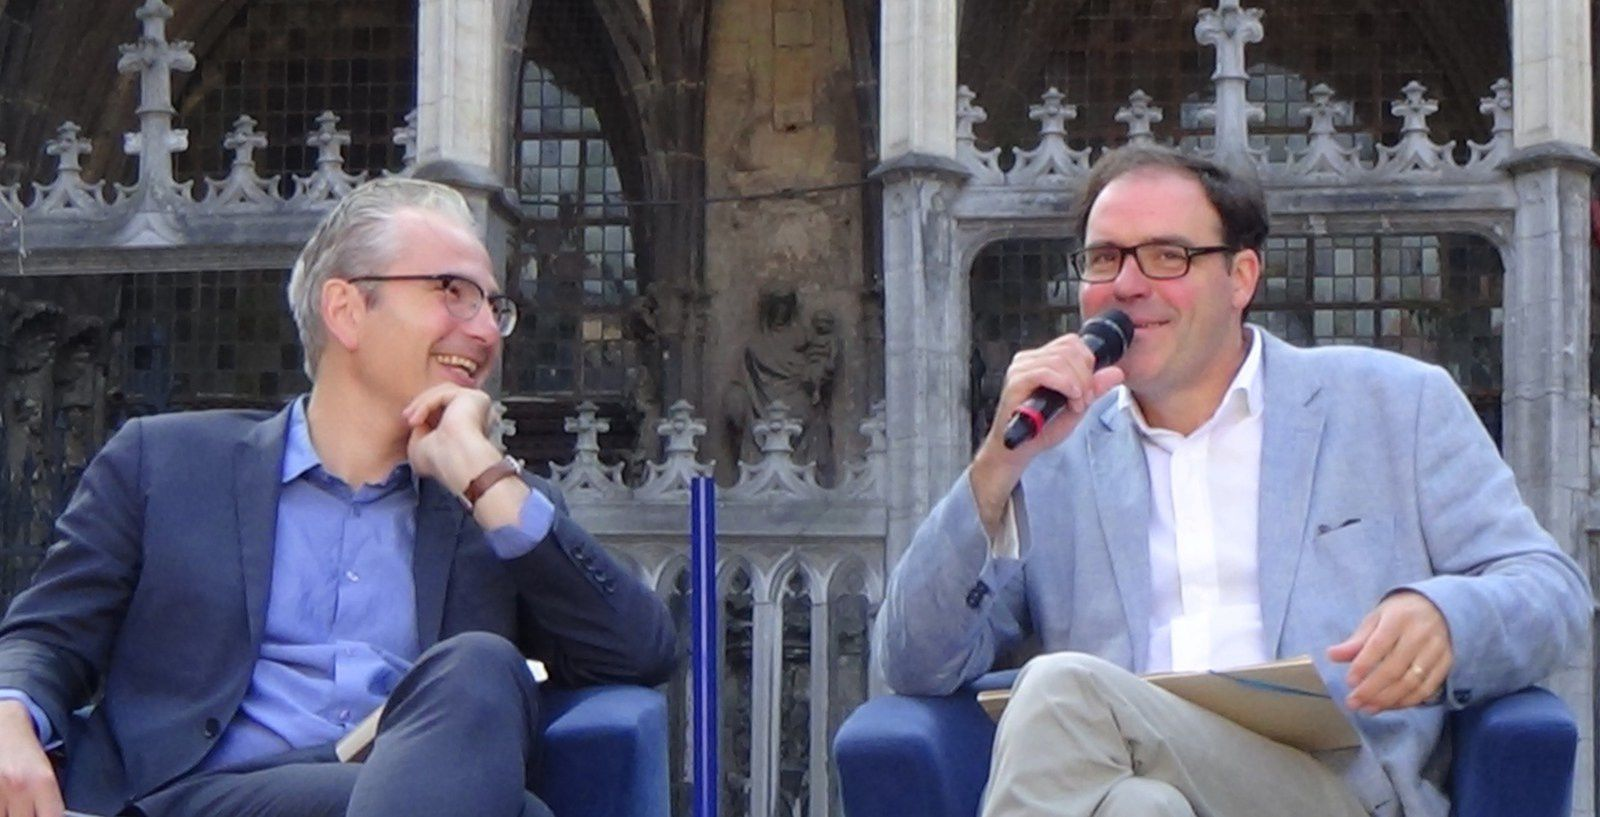 Pascal Chabot - Martin Legros-L'intelligence du changement- Tournai - Photo Virginie Le chêne parlant-